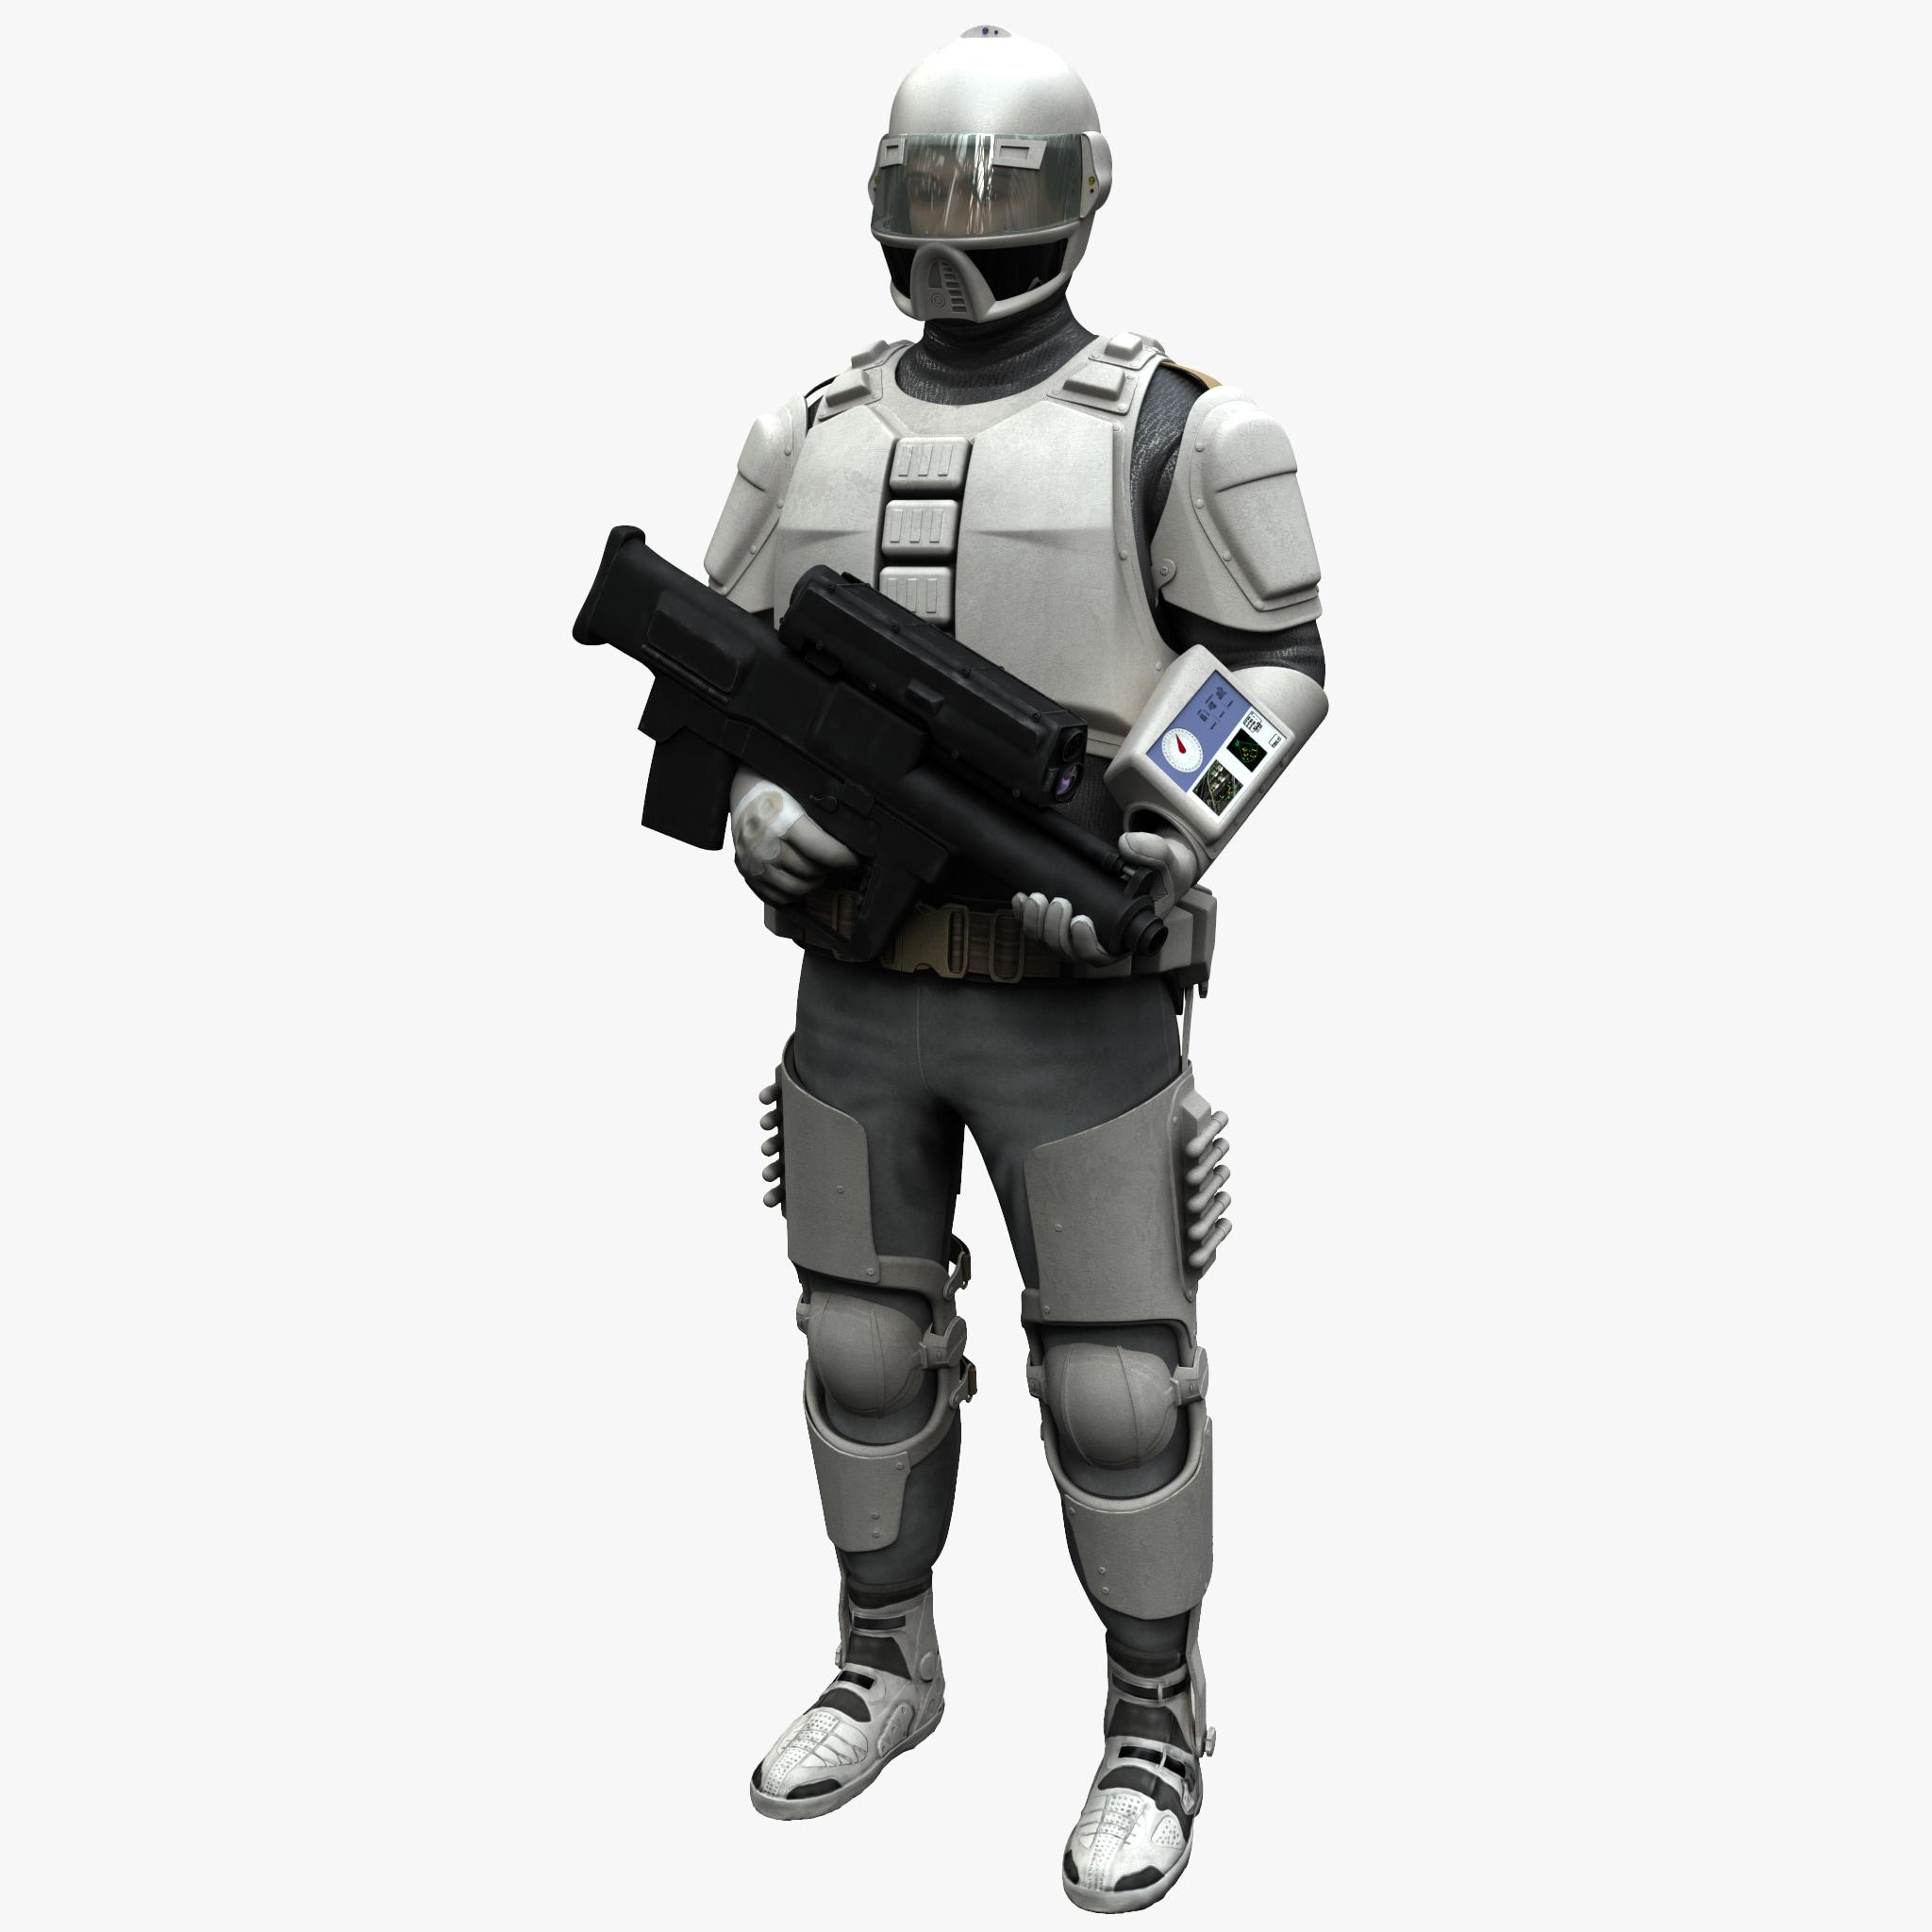 Futuristic Army Solider Pose 1_90.jpg